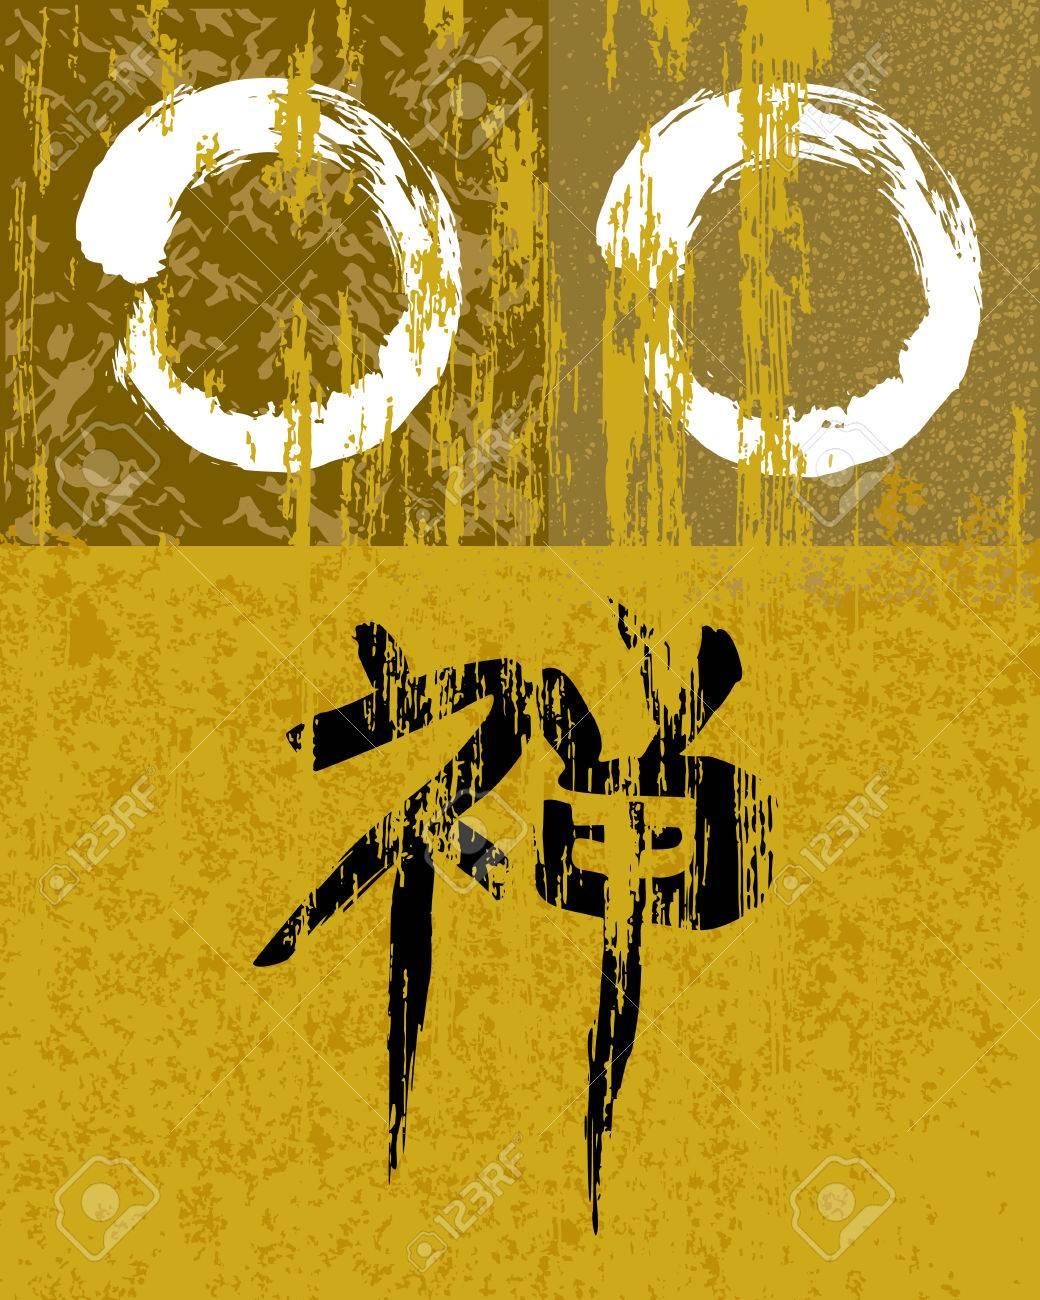 Enso Zen Circle Illustration Over Grunge Texture Background